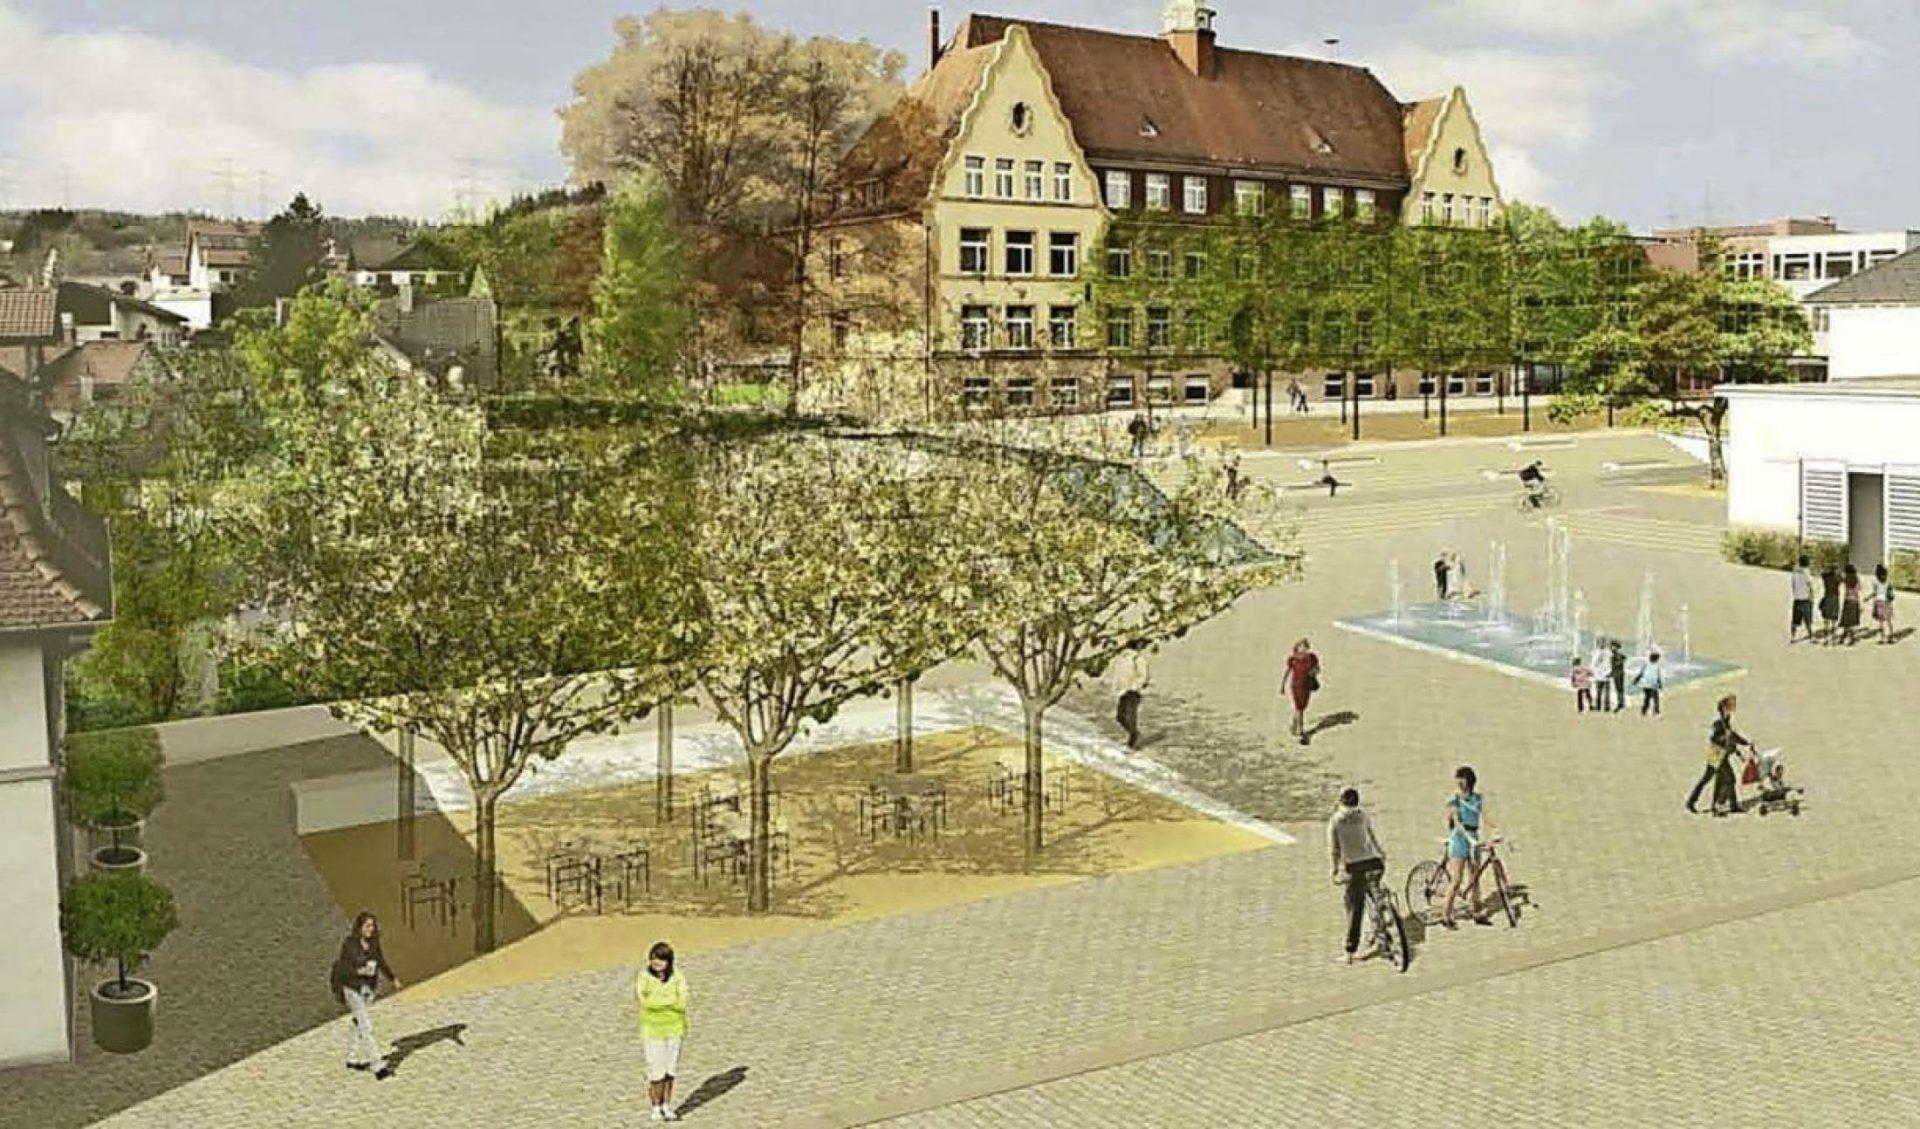 Murg, Neue Mitte Am Bürgerplatz - Perspektive